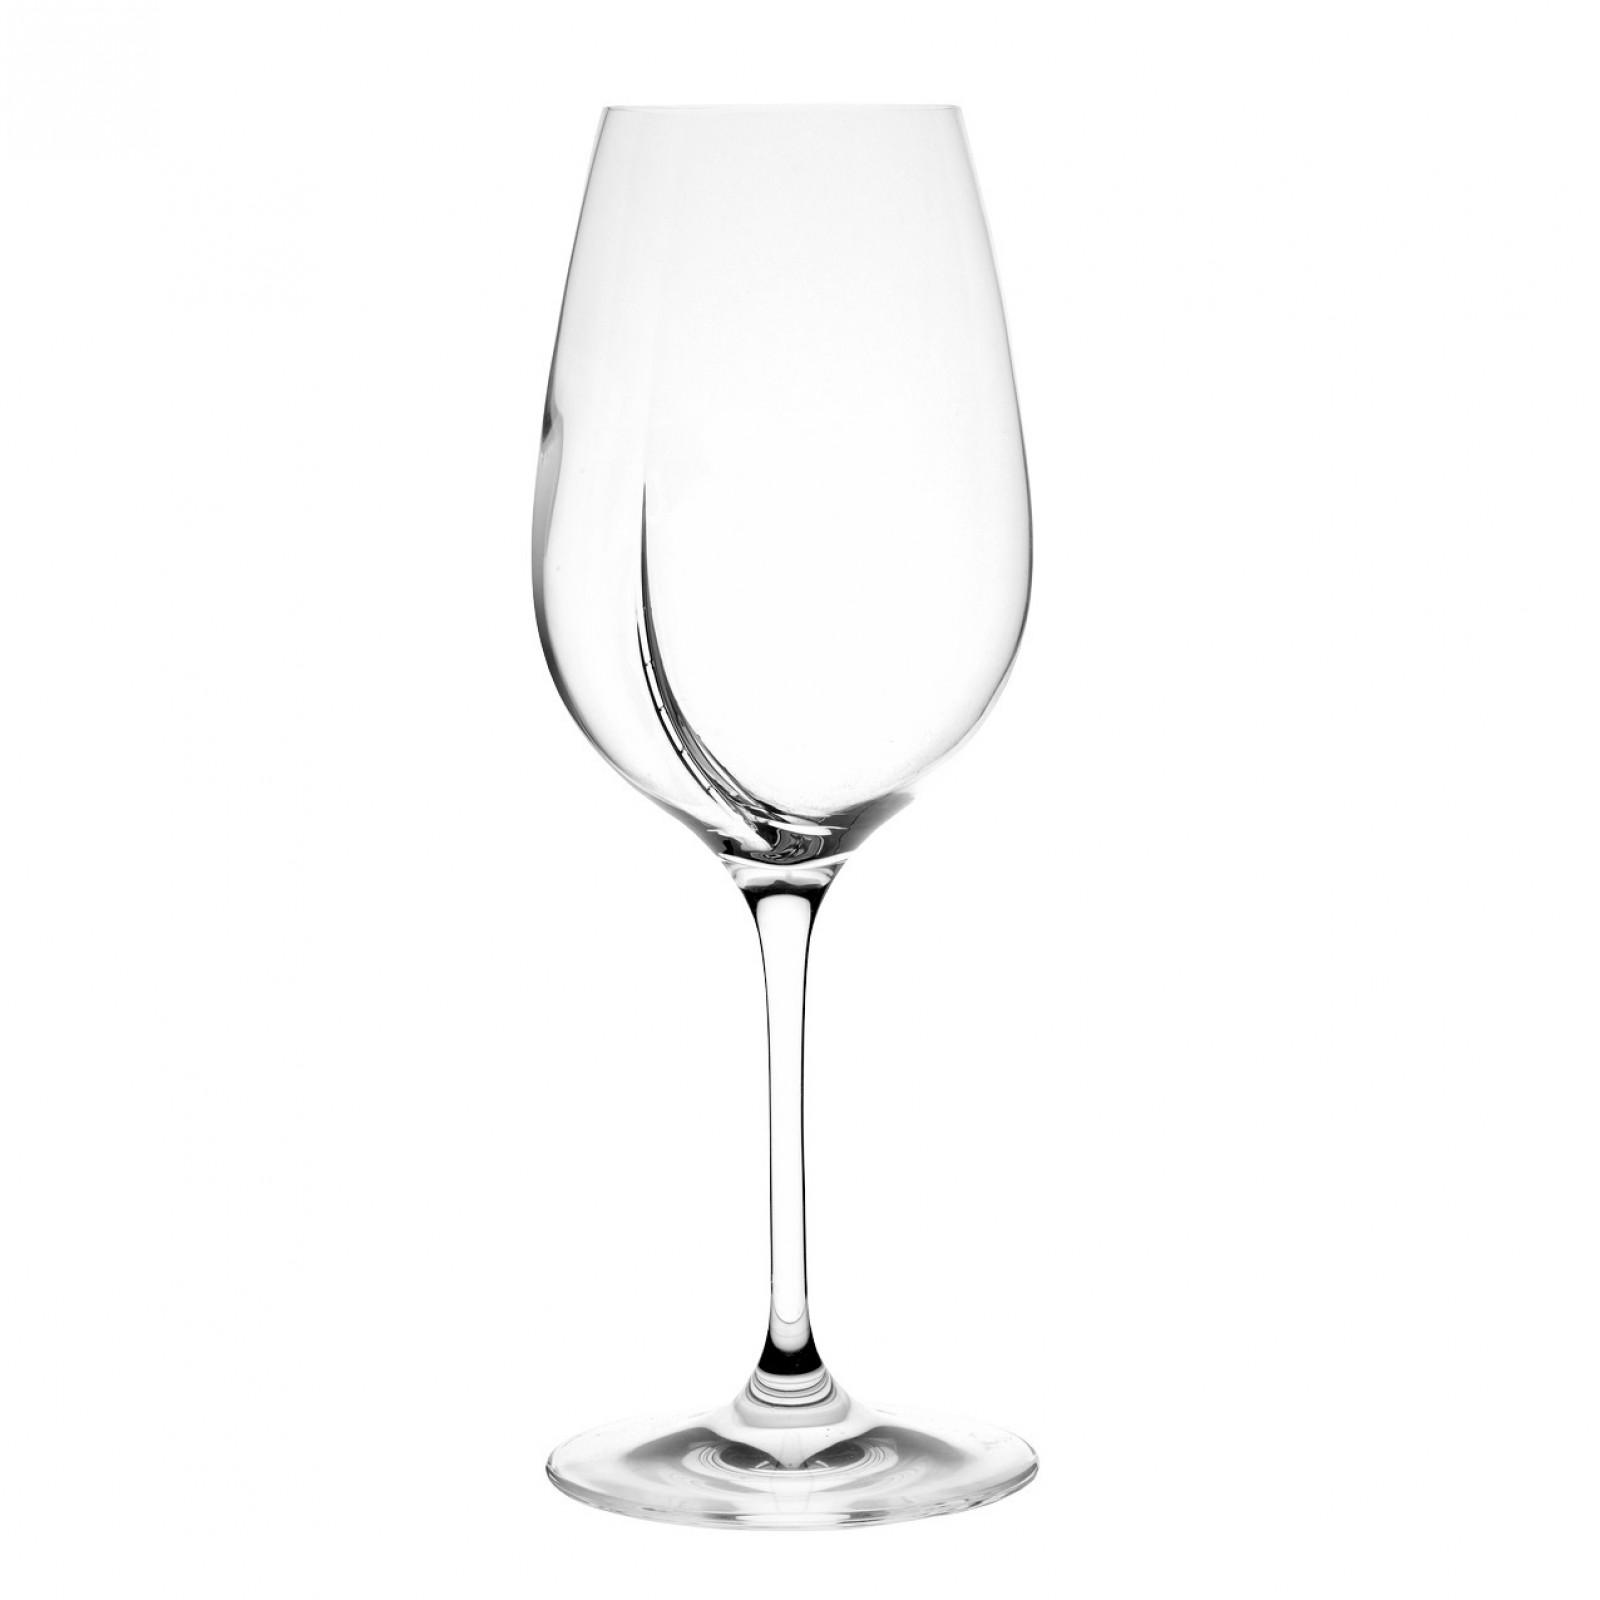 Wine Tasting Glasses Exploreur Oenology (Set of 4) - L' Atelier du Vin